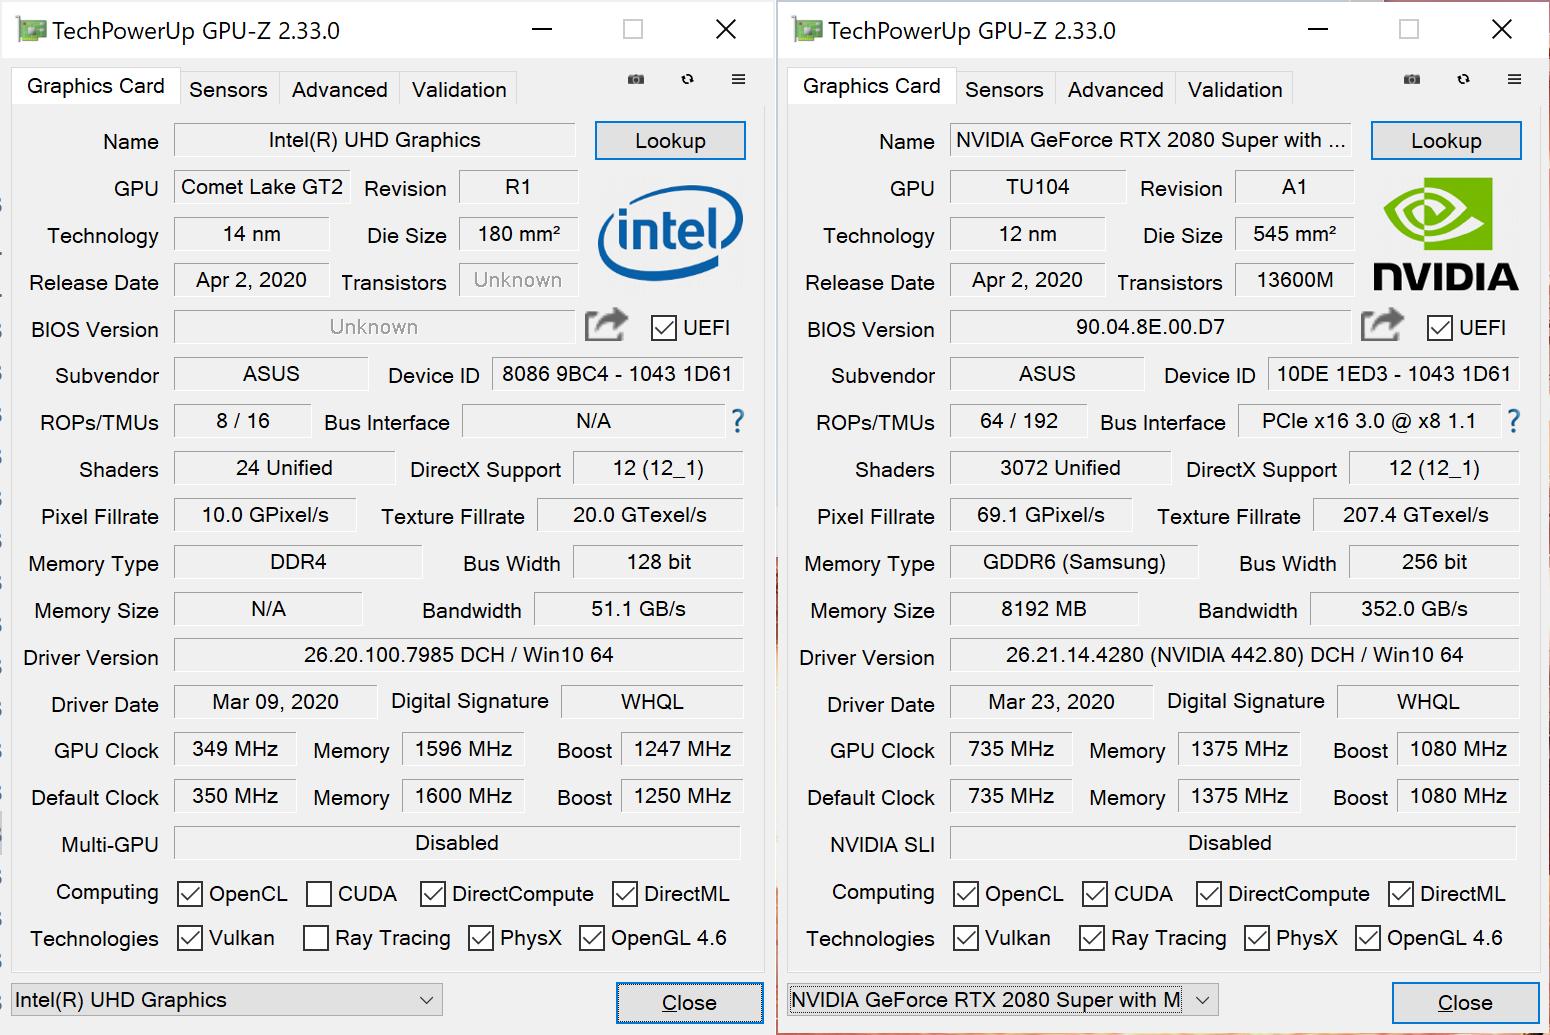 ASUS ROG Zephyrus Duo 15 GPU-Z RTX 2080 Super Max-Q